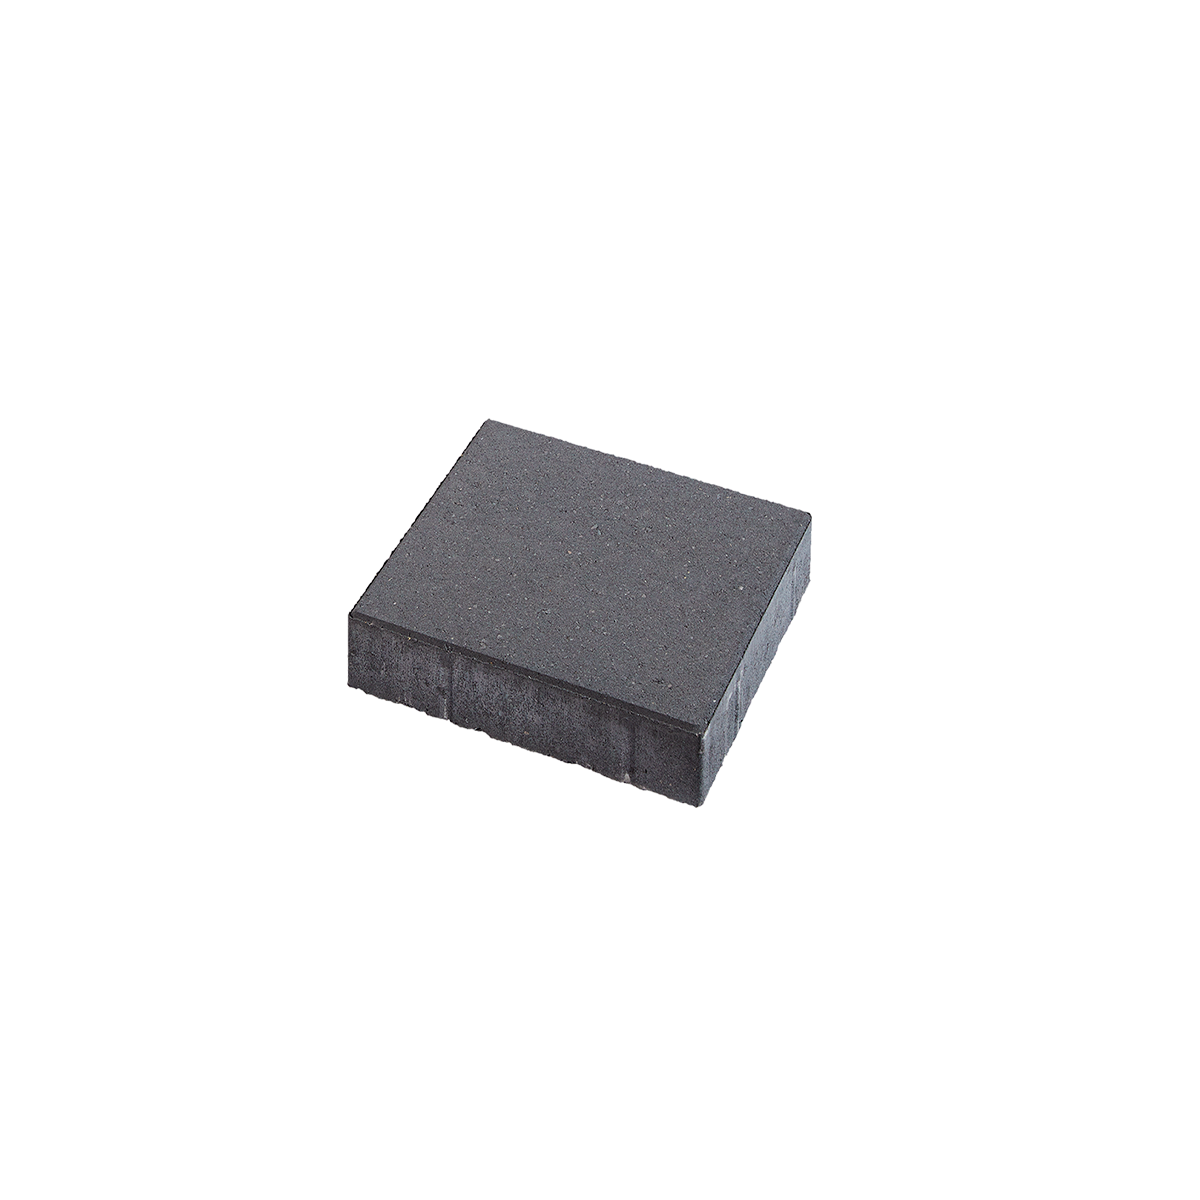 Fliser Modul 30 sort/antracit